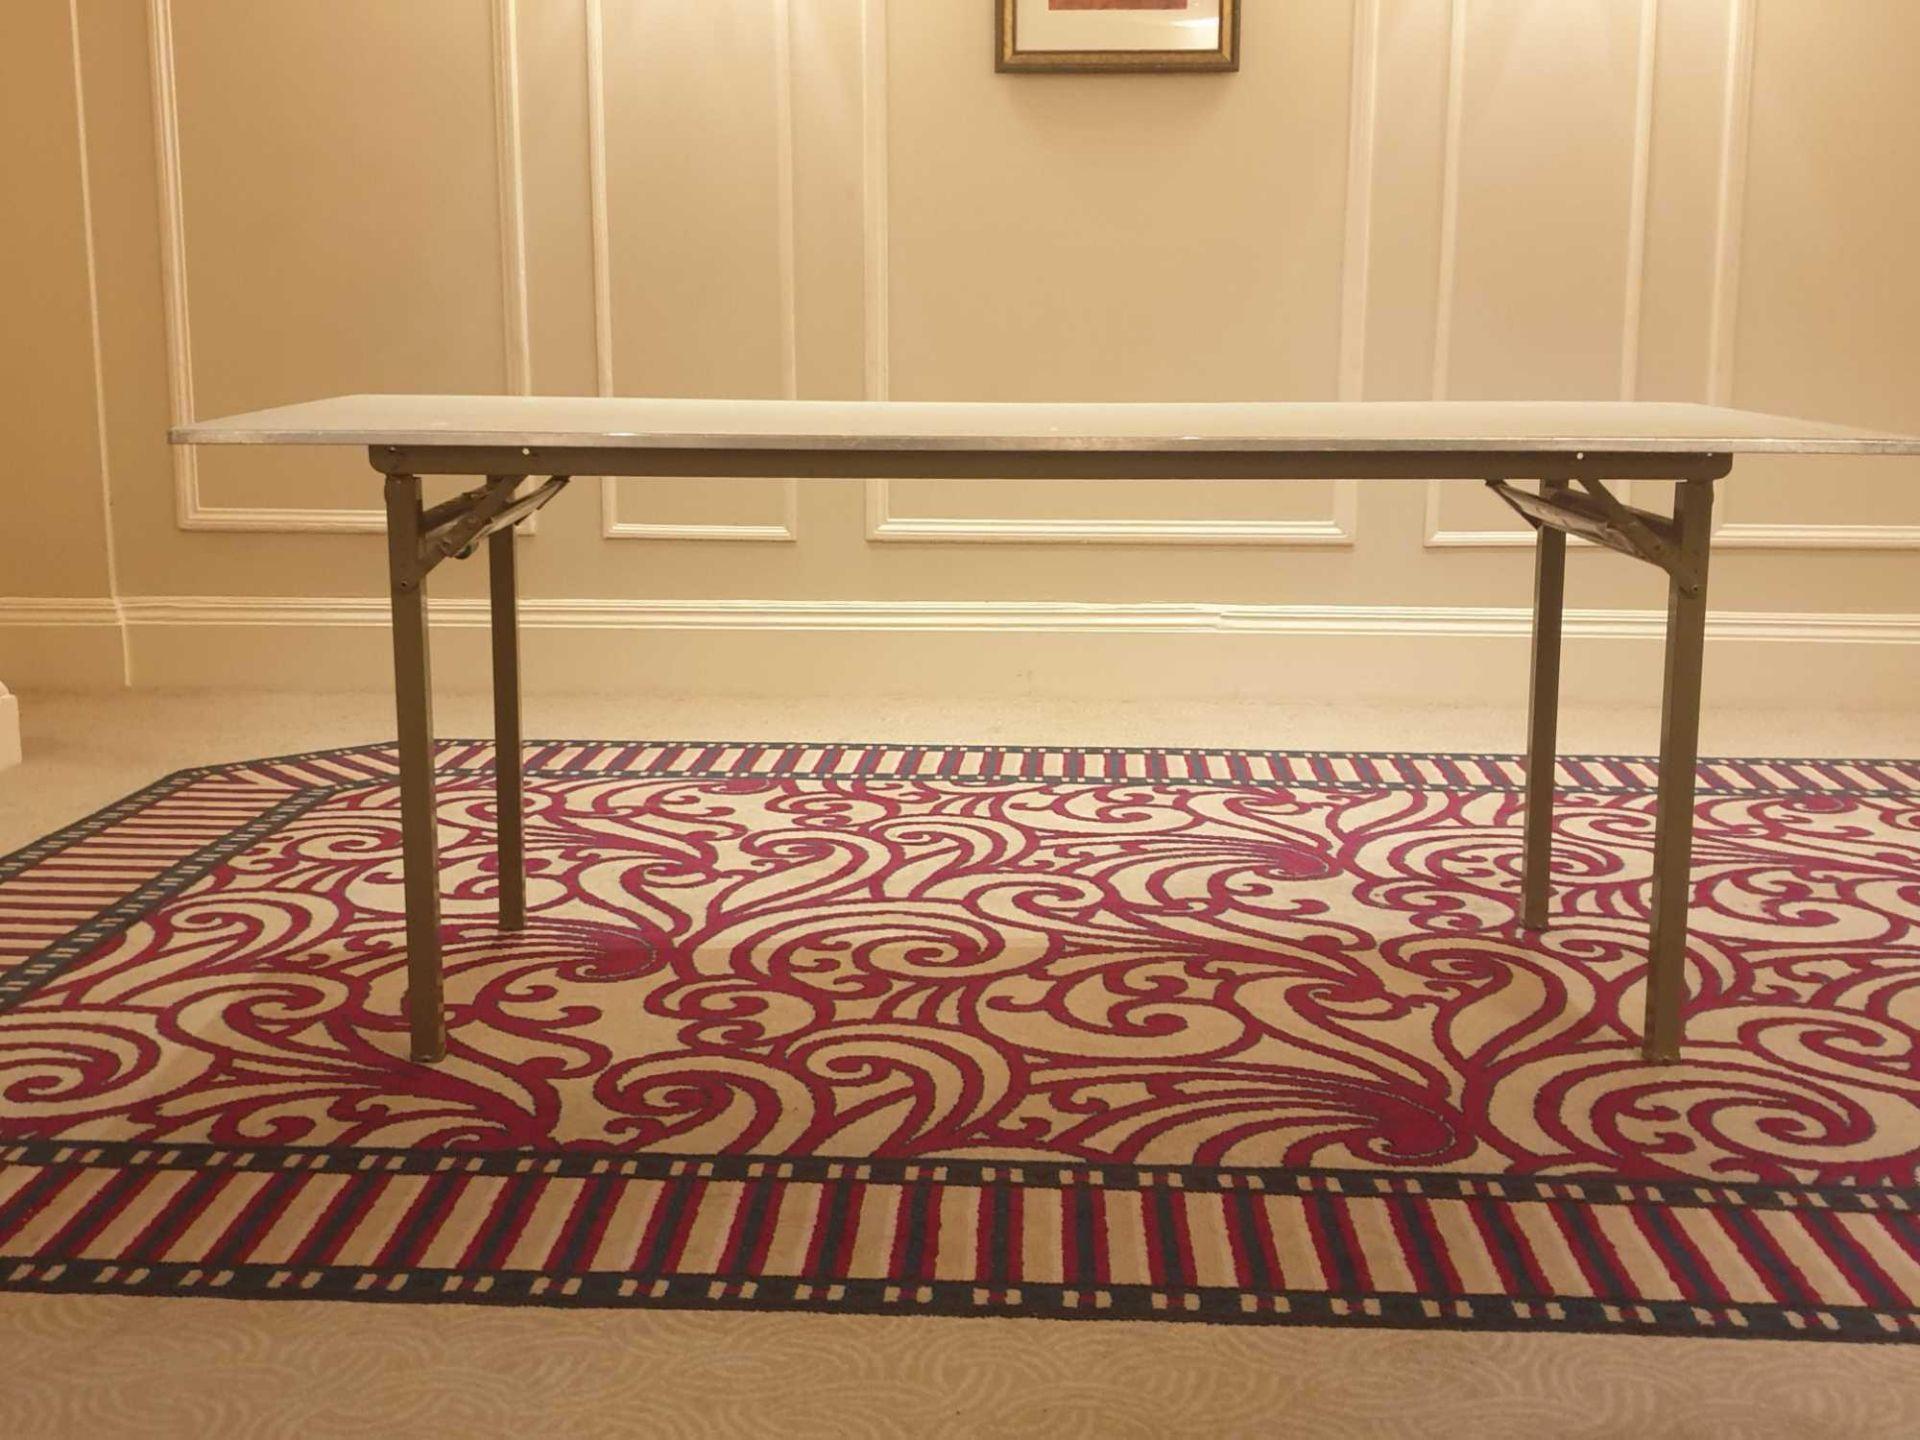 5x Burgess 6ft Folding Flock Padded Rectangular Banquet Table 77x 183x 72cm ( Loc Mount Vernon - Image 2 of 2